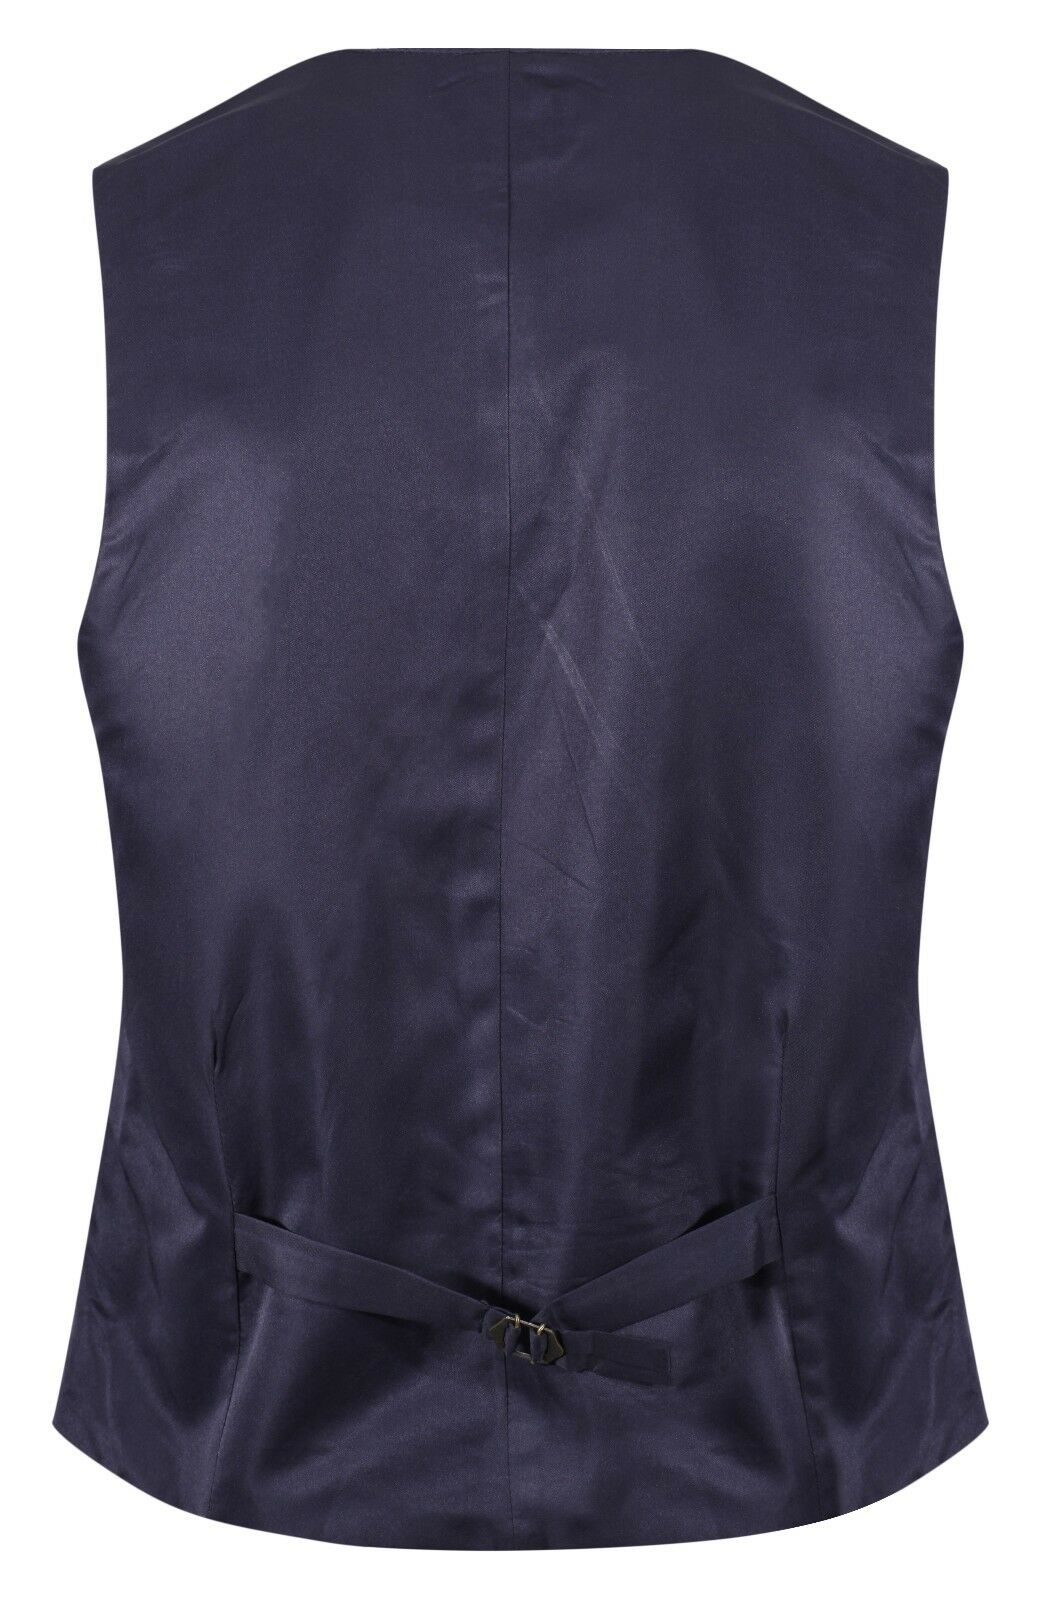 Homme Mélange Glendale Laine Glendale Mélange Royal Navy Tweed Bleu Carreaux Gilet qualité gilet 774986